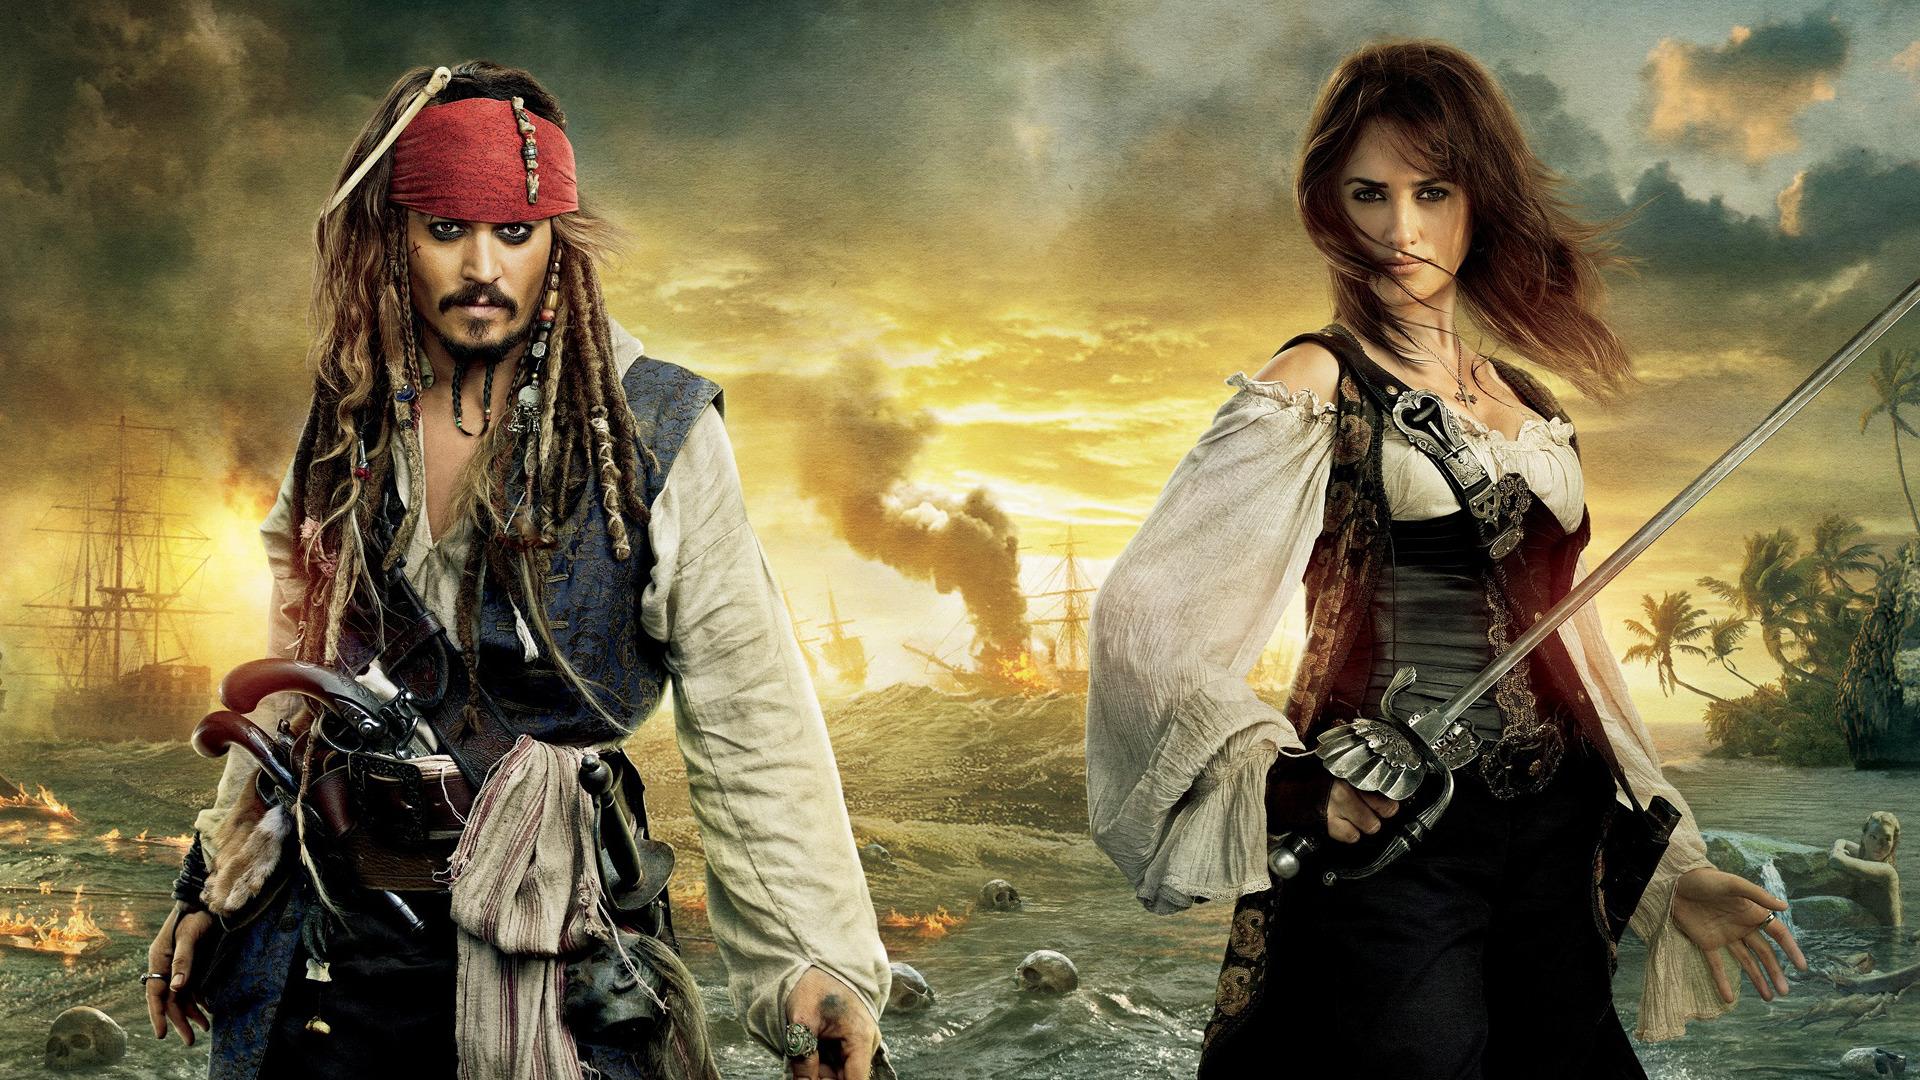 Pirates of the Caribbean: On Stranger Tides | Movie fanart ...